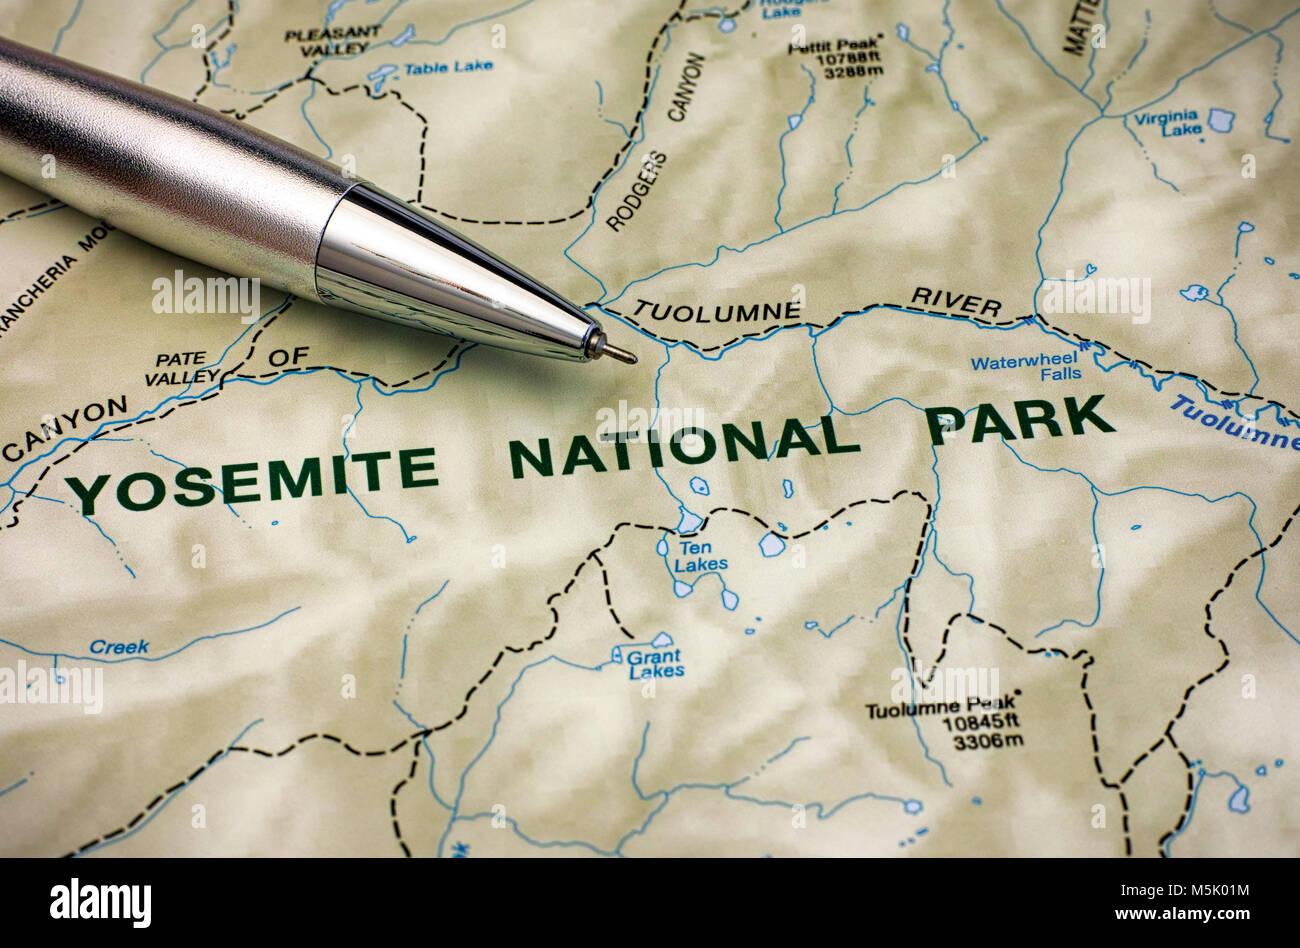 Cartina Yosemite National Park.Map Of Yosemite National Park With Pen Close Up Stock Photo Alamy